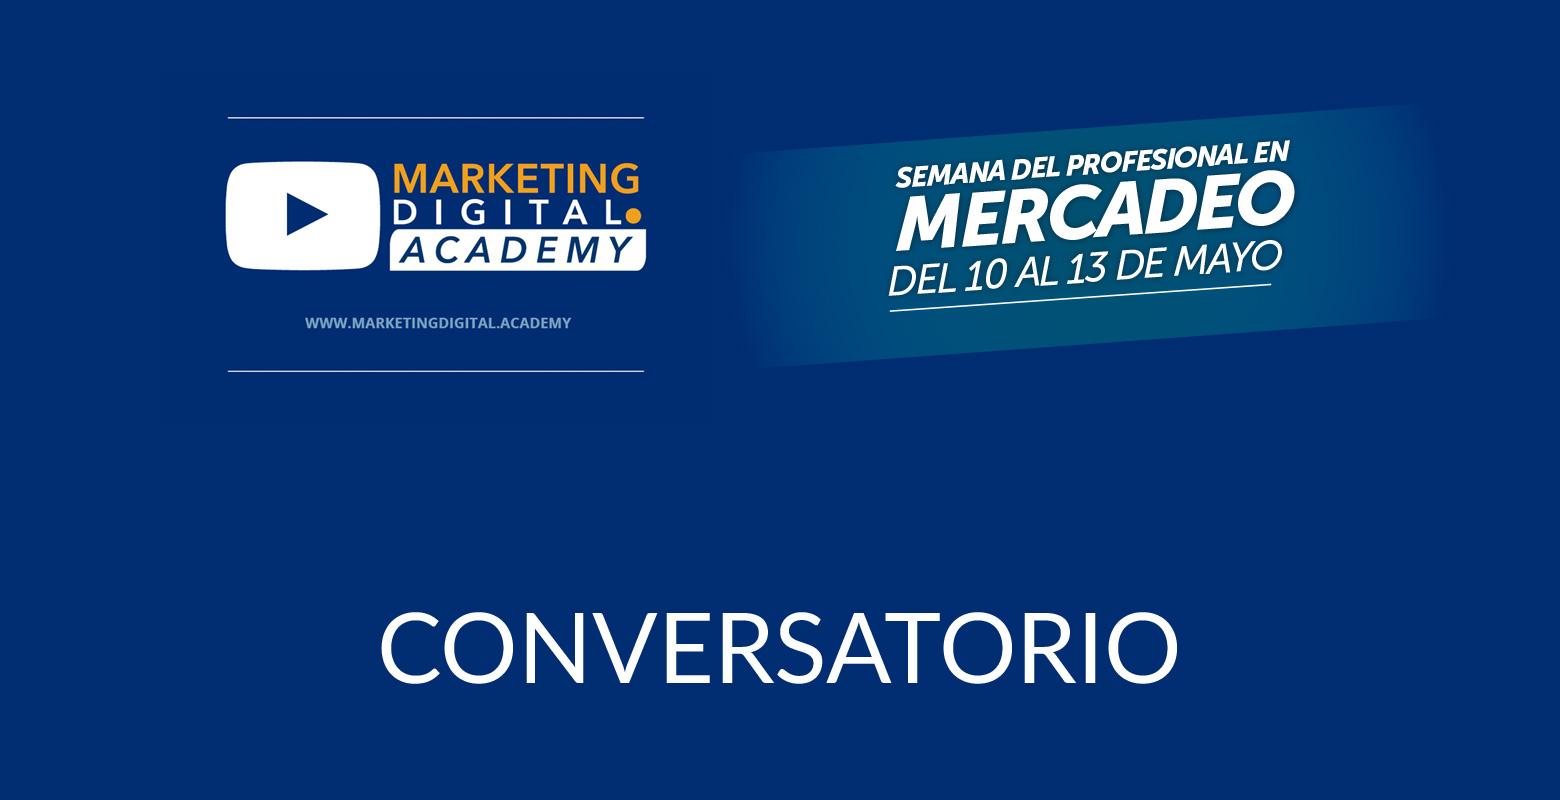 2016_05_04_not_semanamk_conversatorio_logos